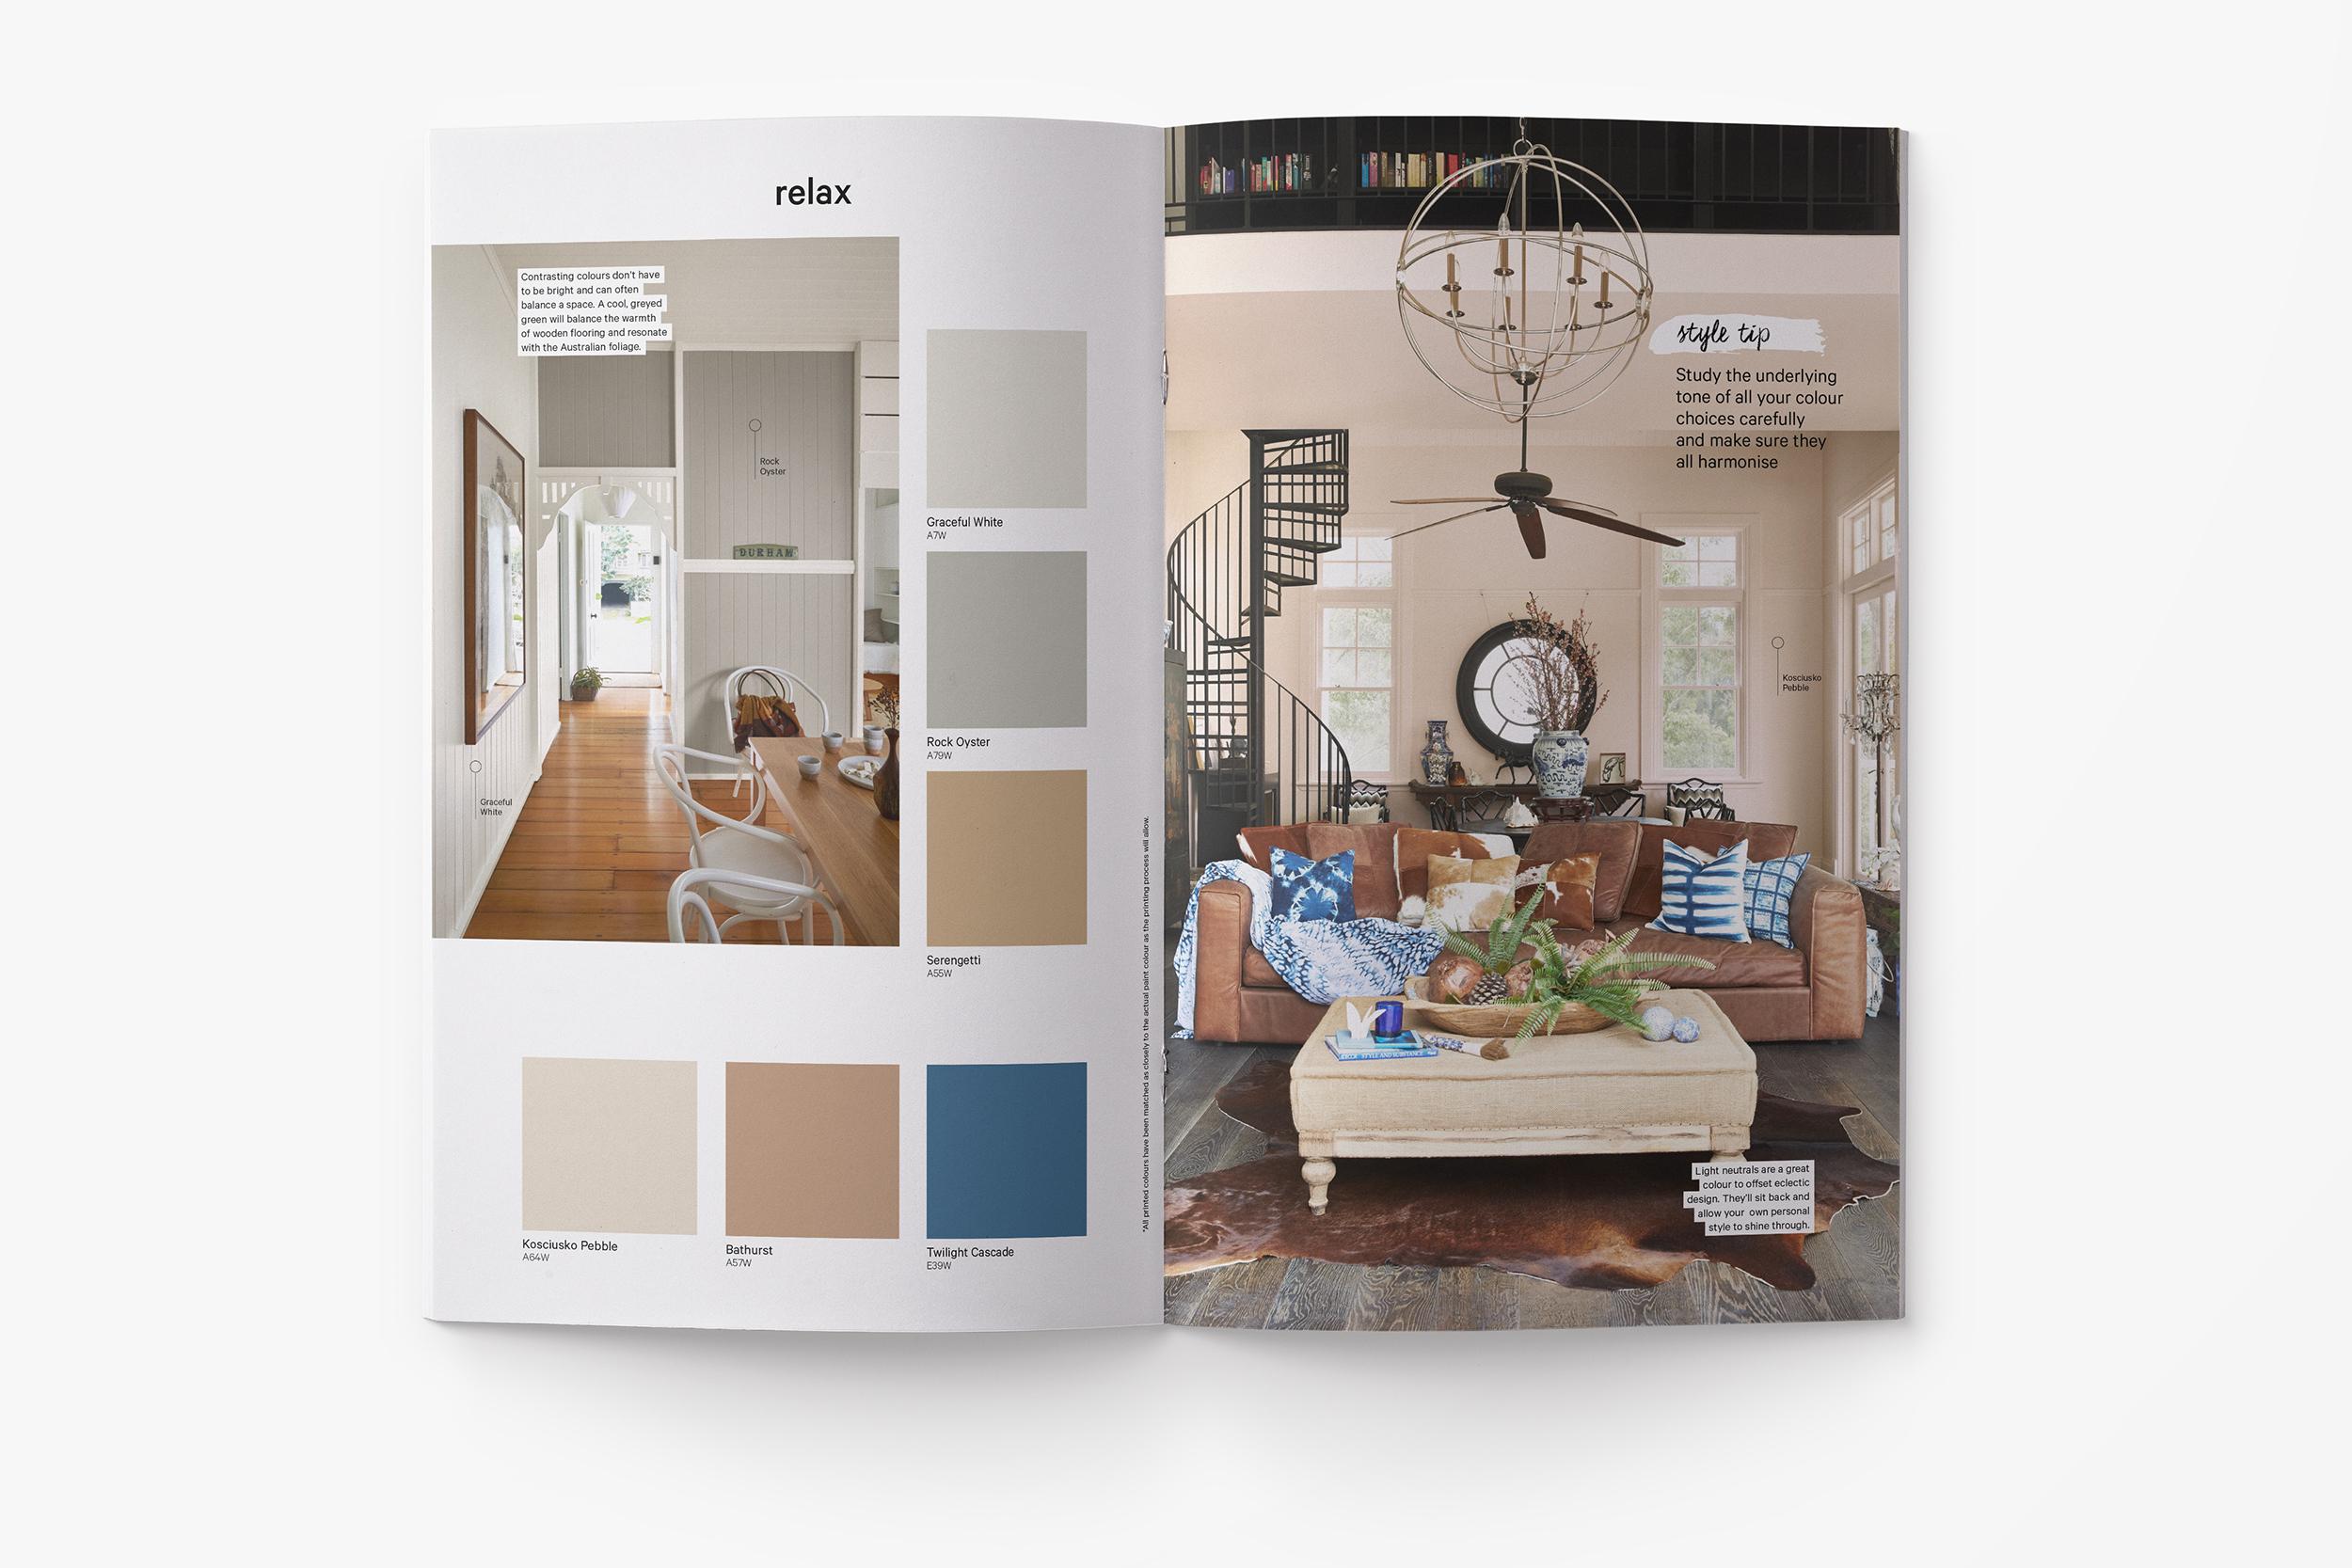 wattyl_interior-inside-1.jpg